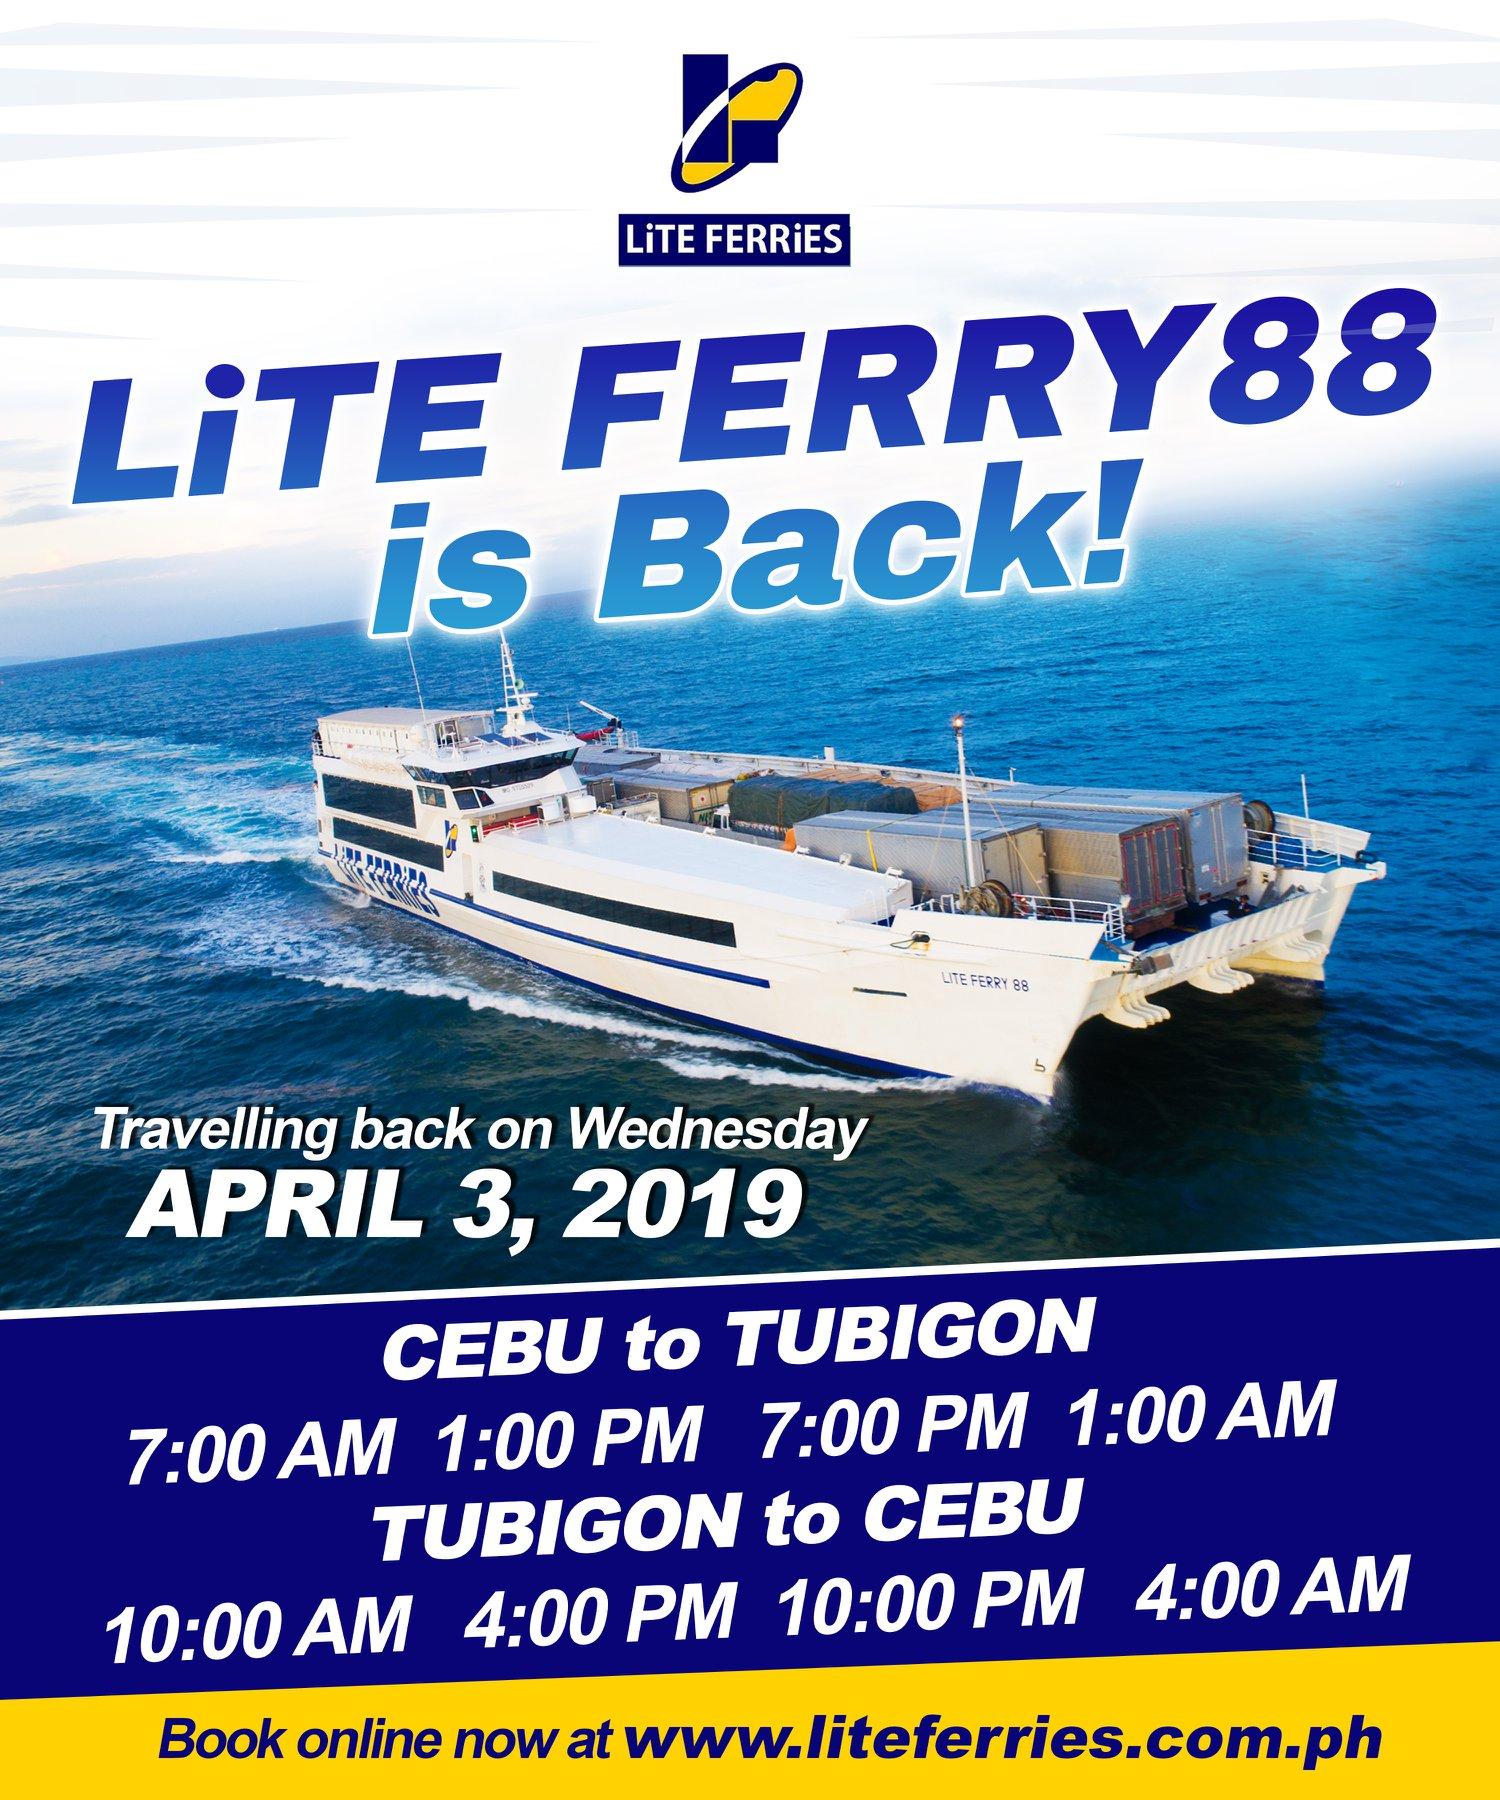 2019 Cebu – Tubigon: Lite Ferries Boat Schedules, Fares & Booking